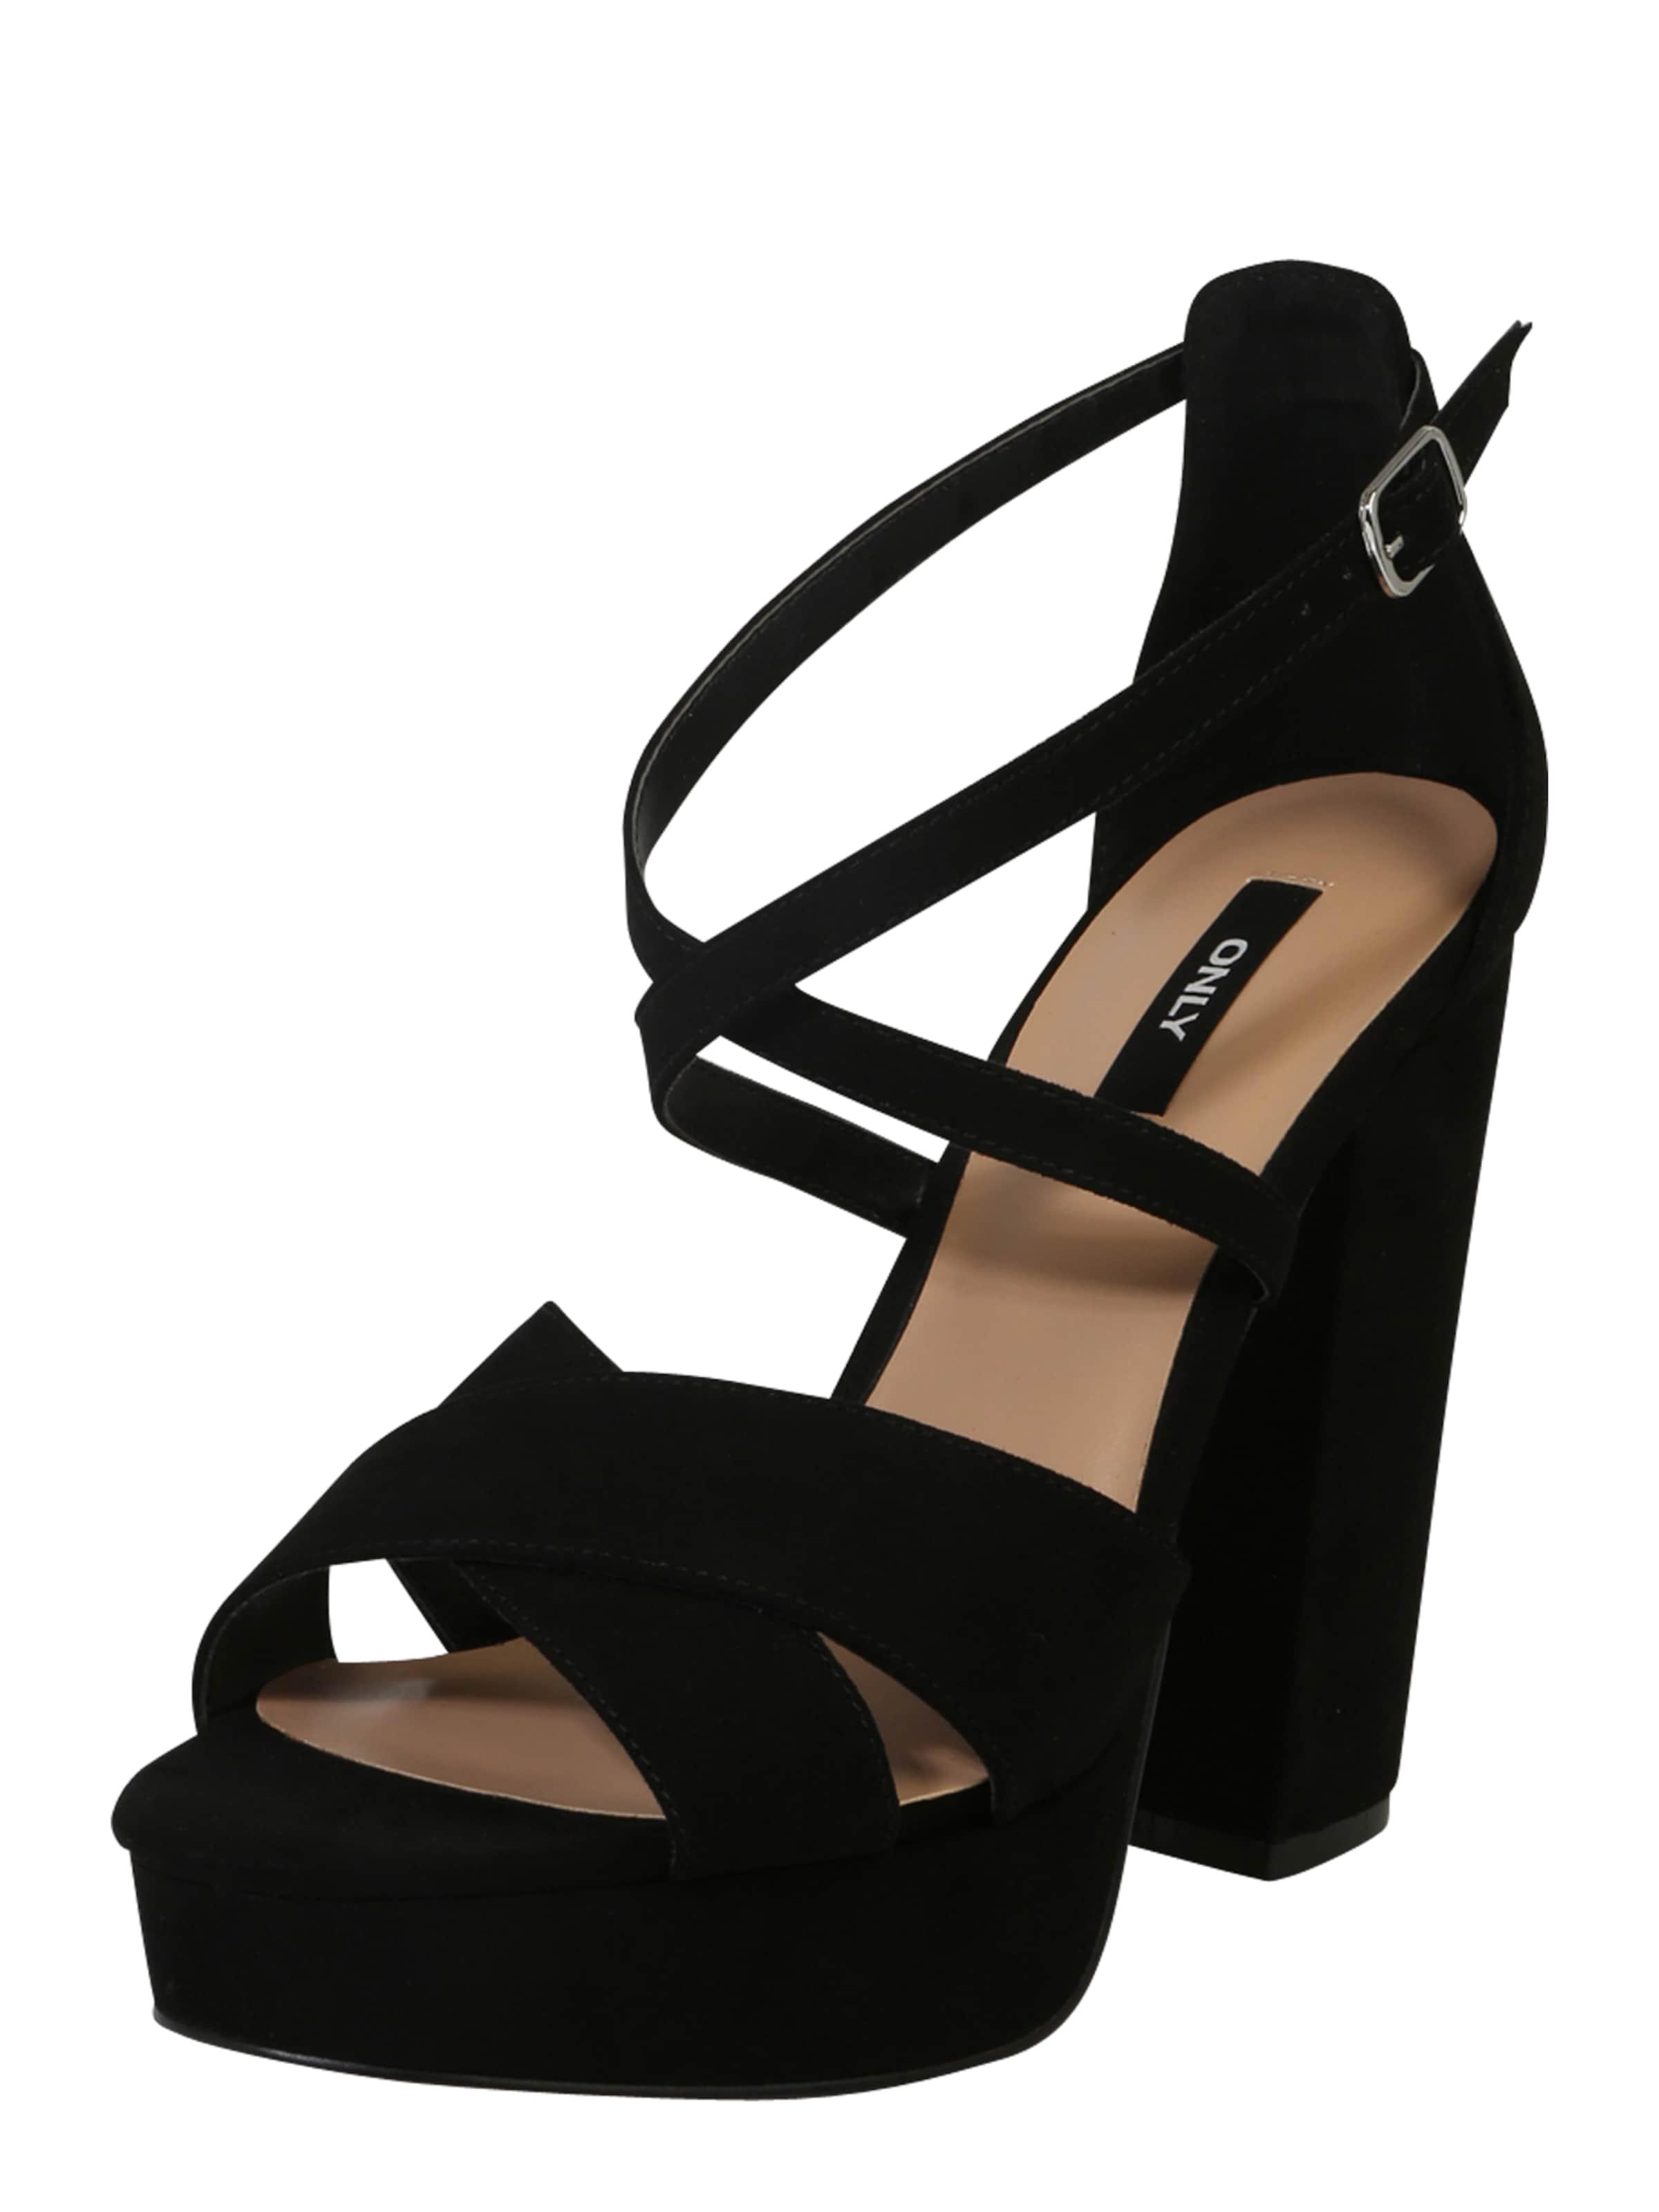 Haltbare Mode billige Schuhe ONLY | Plateau-Sandalette 'ALLIE' Schuhe Gut getragene Schuhe